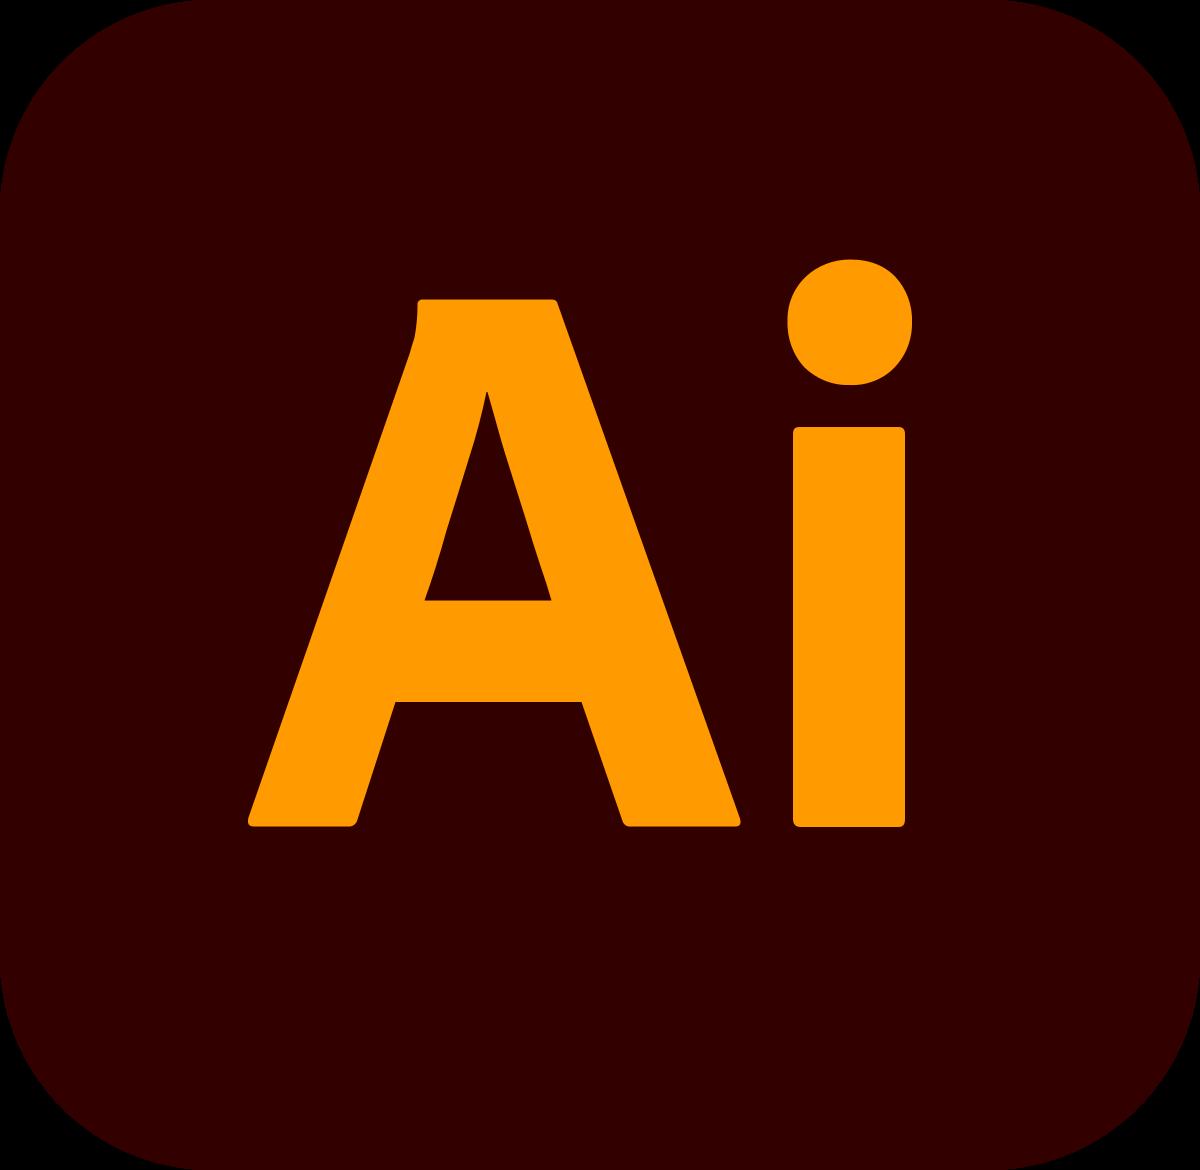 Adobe Illustrator 2021 v25.2.0.220 With Crack [Latest]